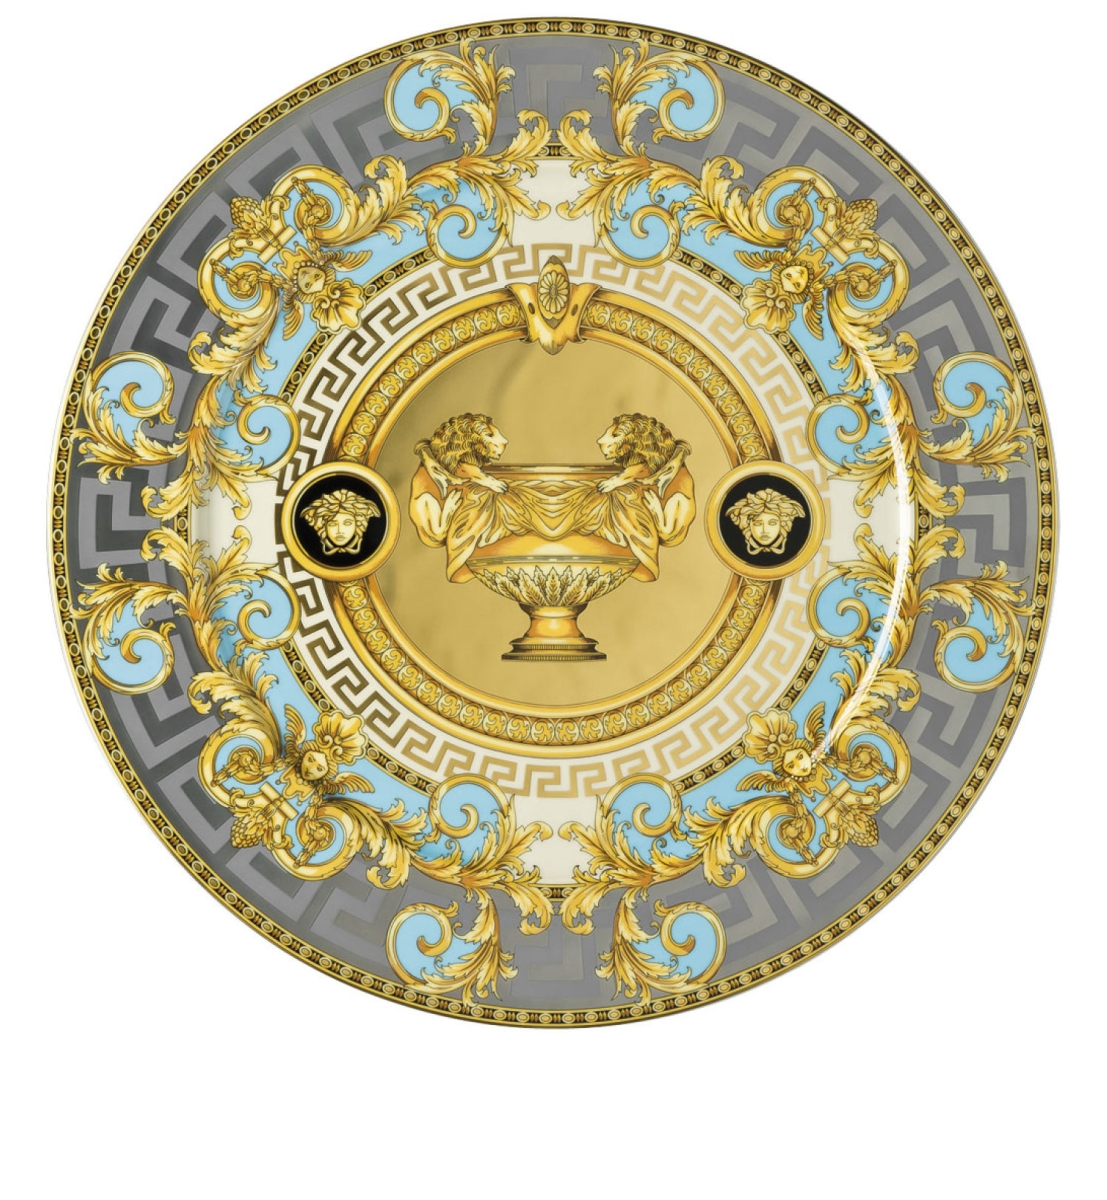 6d34026da049 plate Rosenthal prestige gala le bleu plate 10450-403638-10263